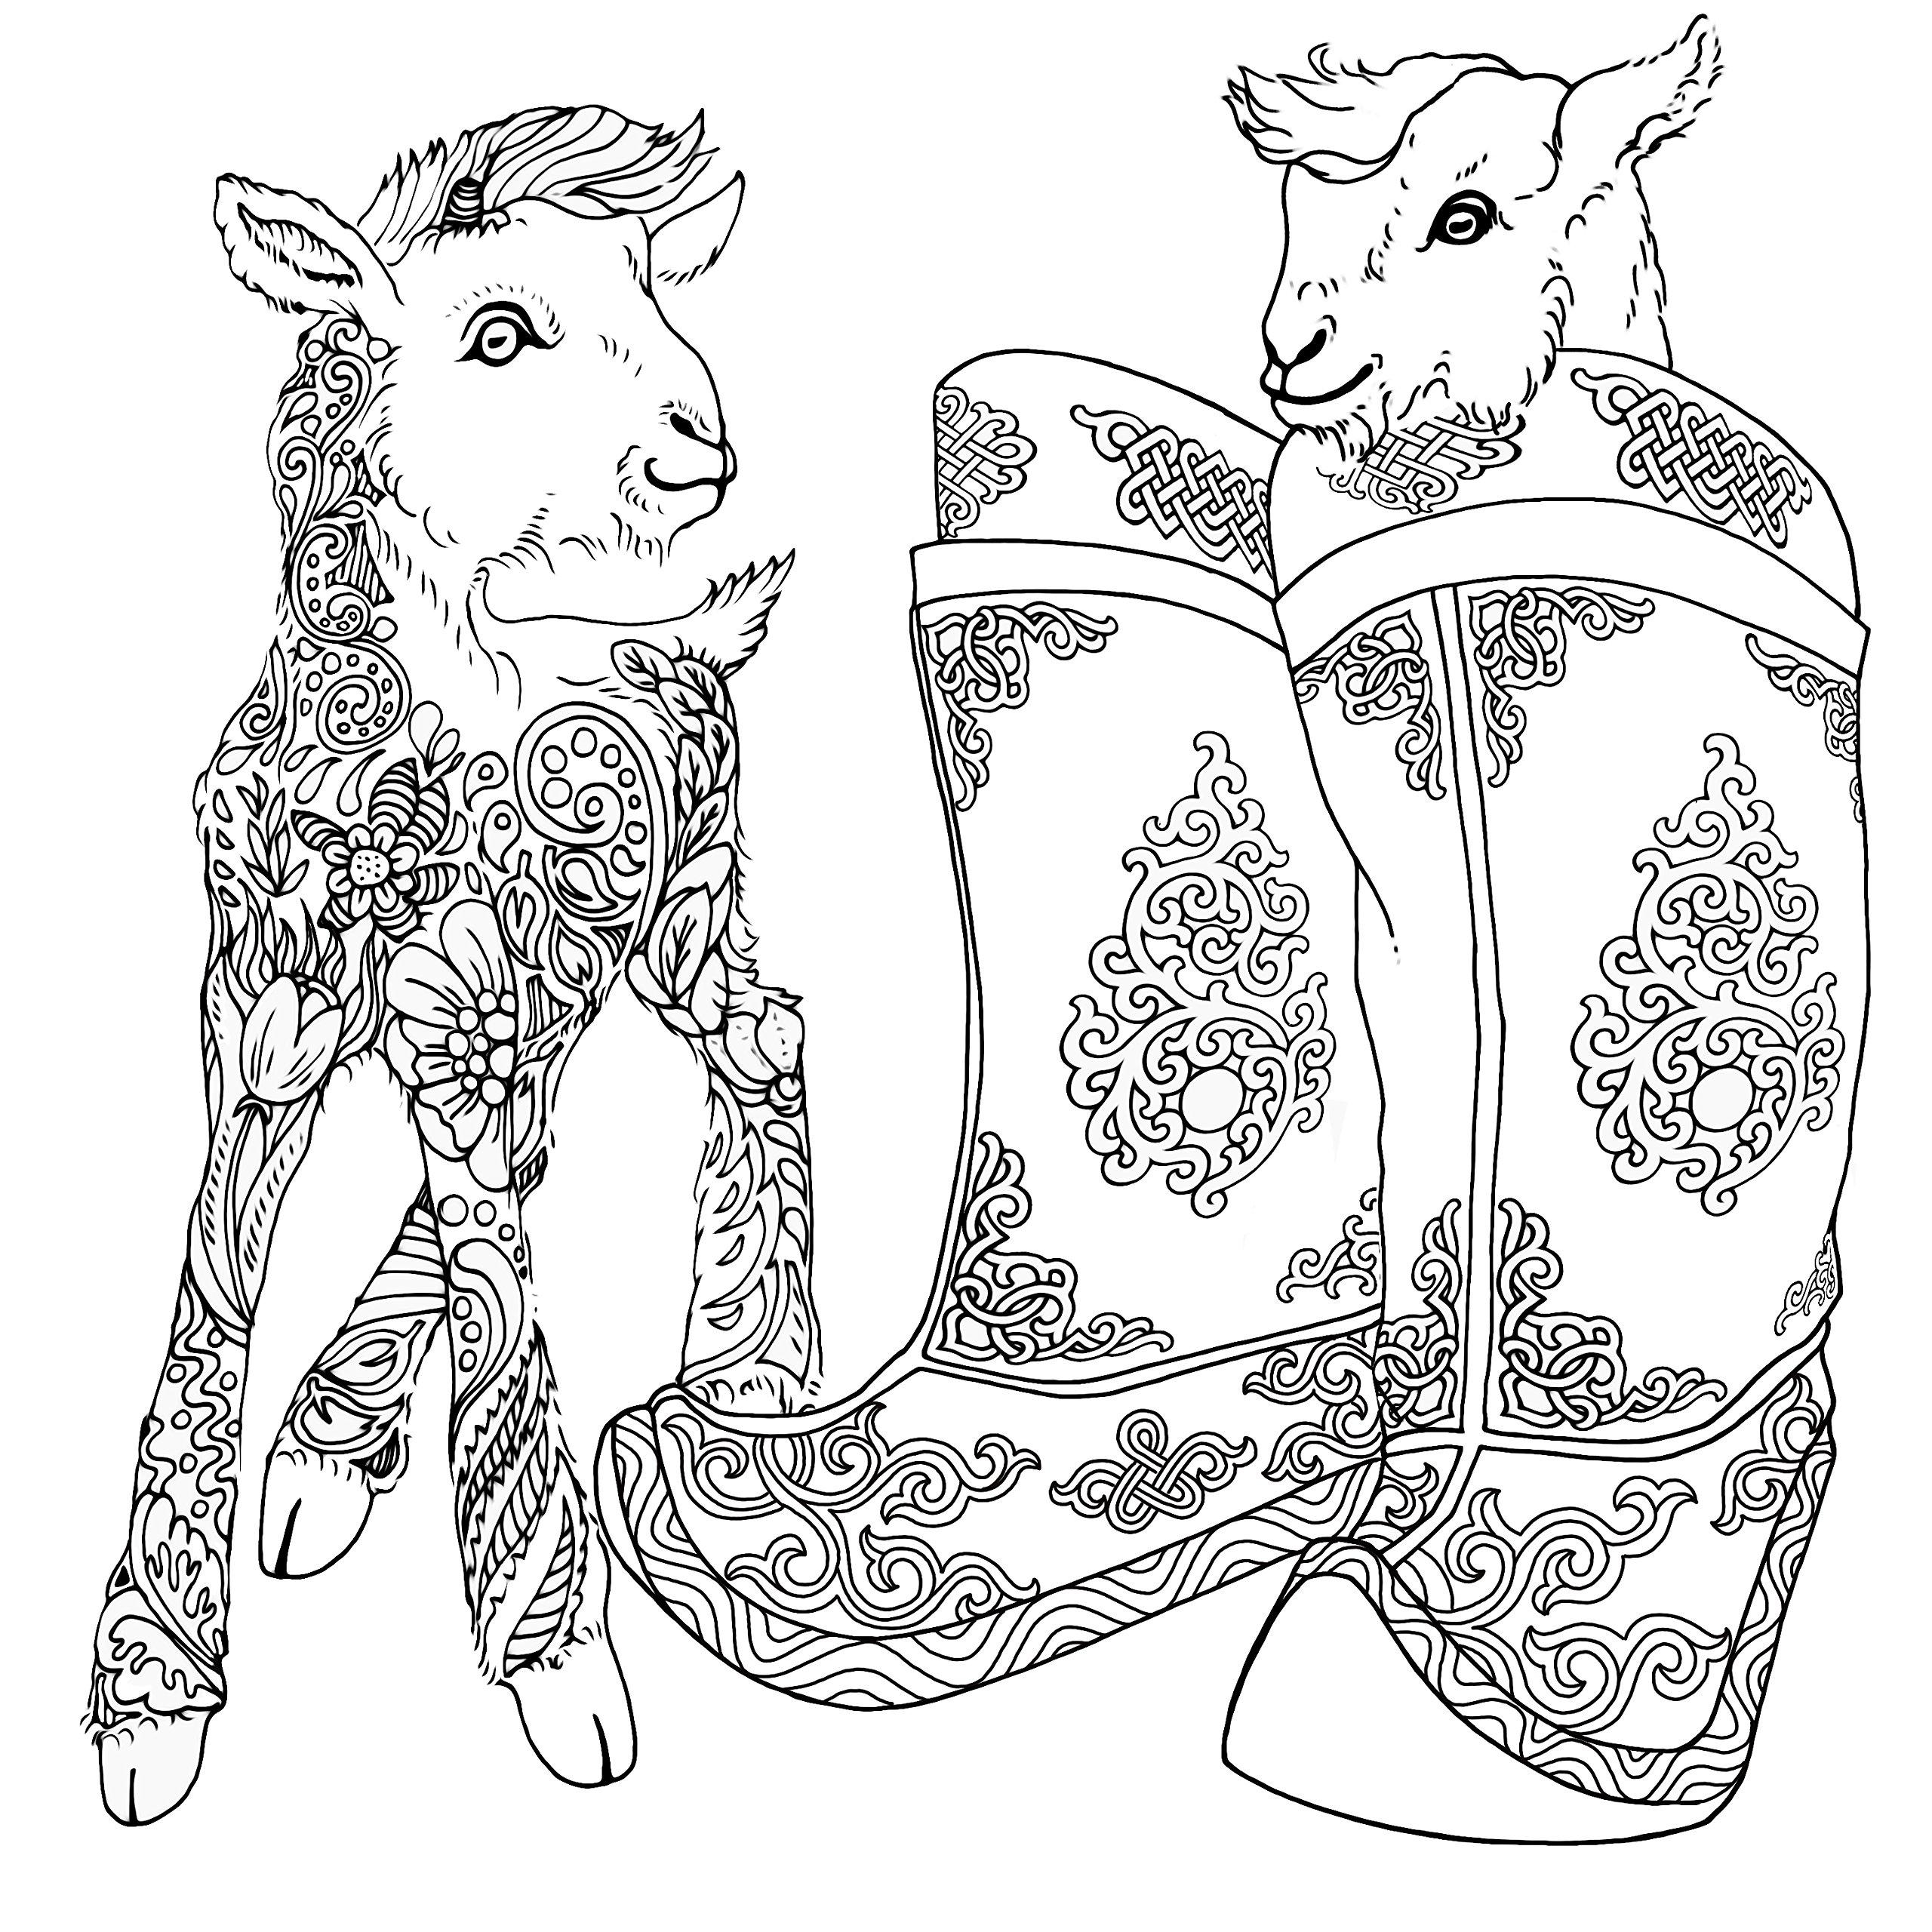 magnificent mongolia urambileg boldgarav zolboo ganbold itgel Mongolian Fashion magnificent mongolia urambileg boldgarav zolboo ganbold itgel chuluunbaatar sugarjav altan ochir 9789997335562 amazon books